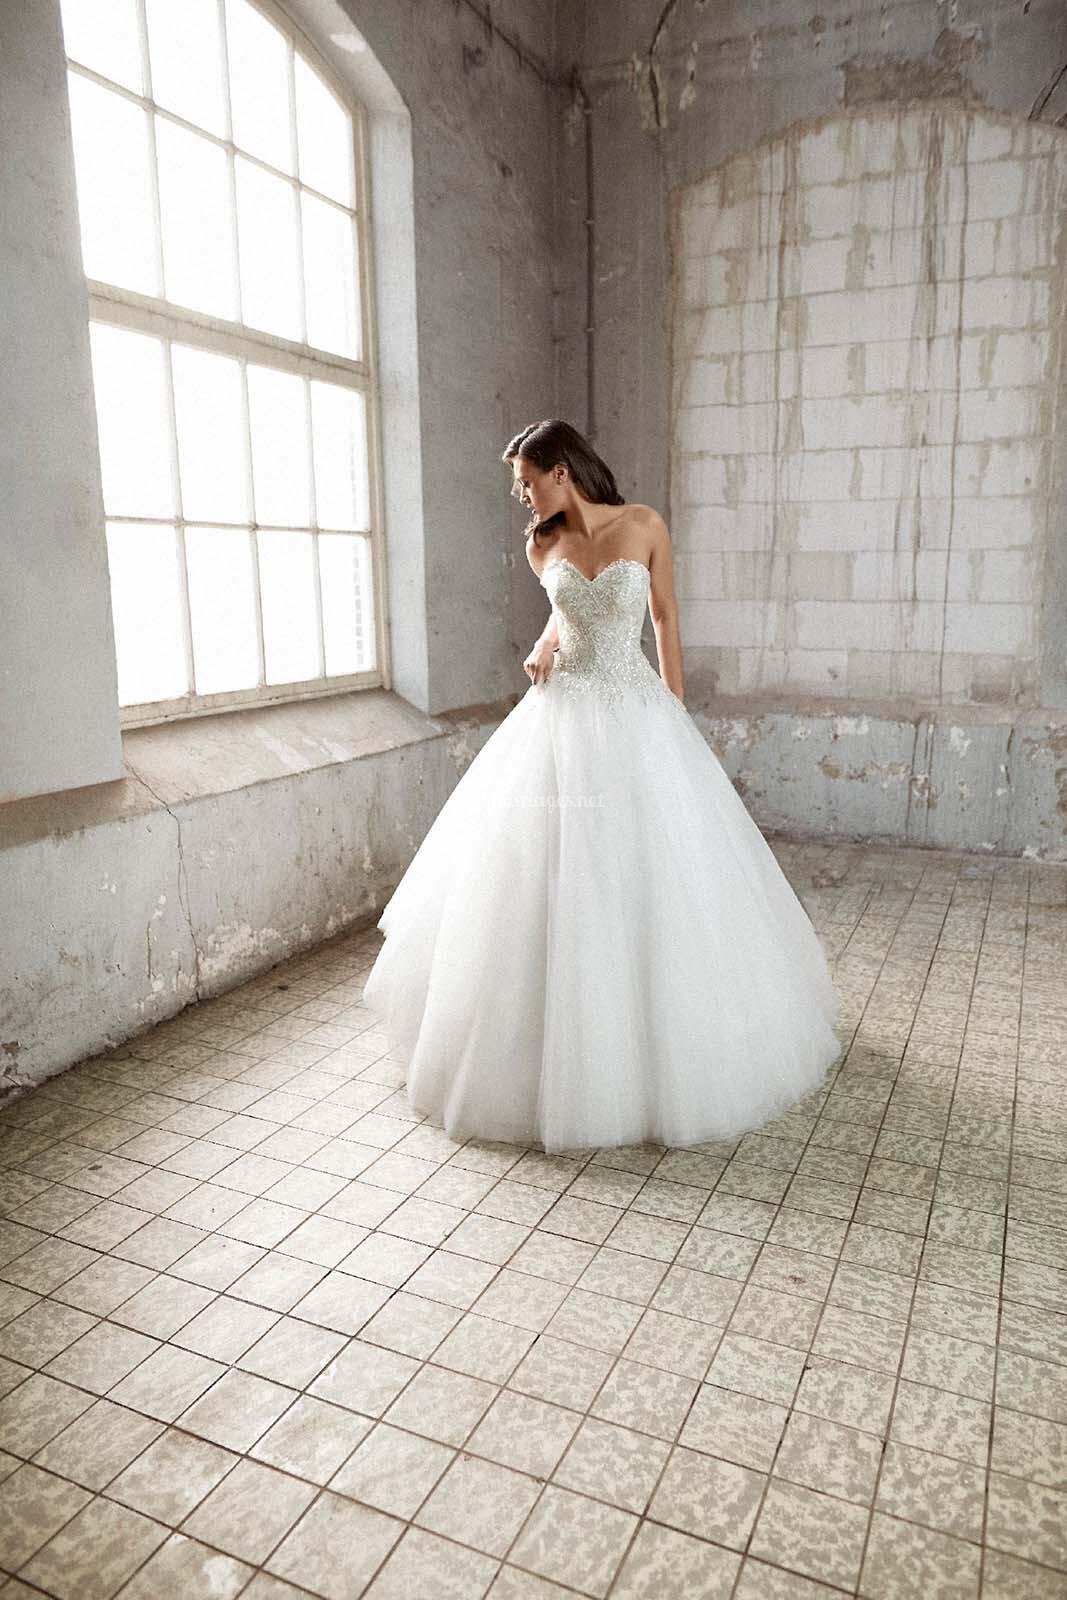 Sur Robes Mariée Bridals Crystalline Auva De UVGLzqSpjM